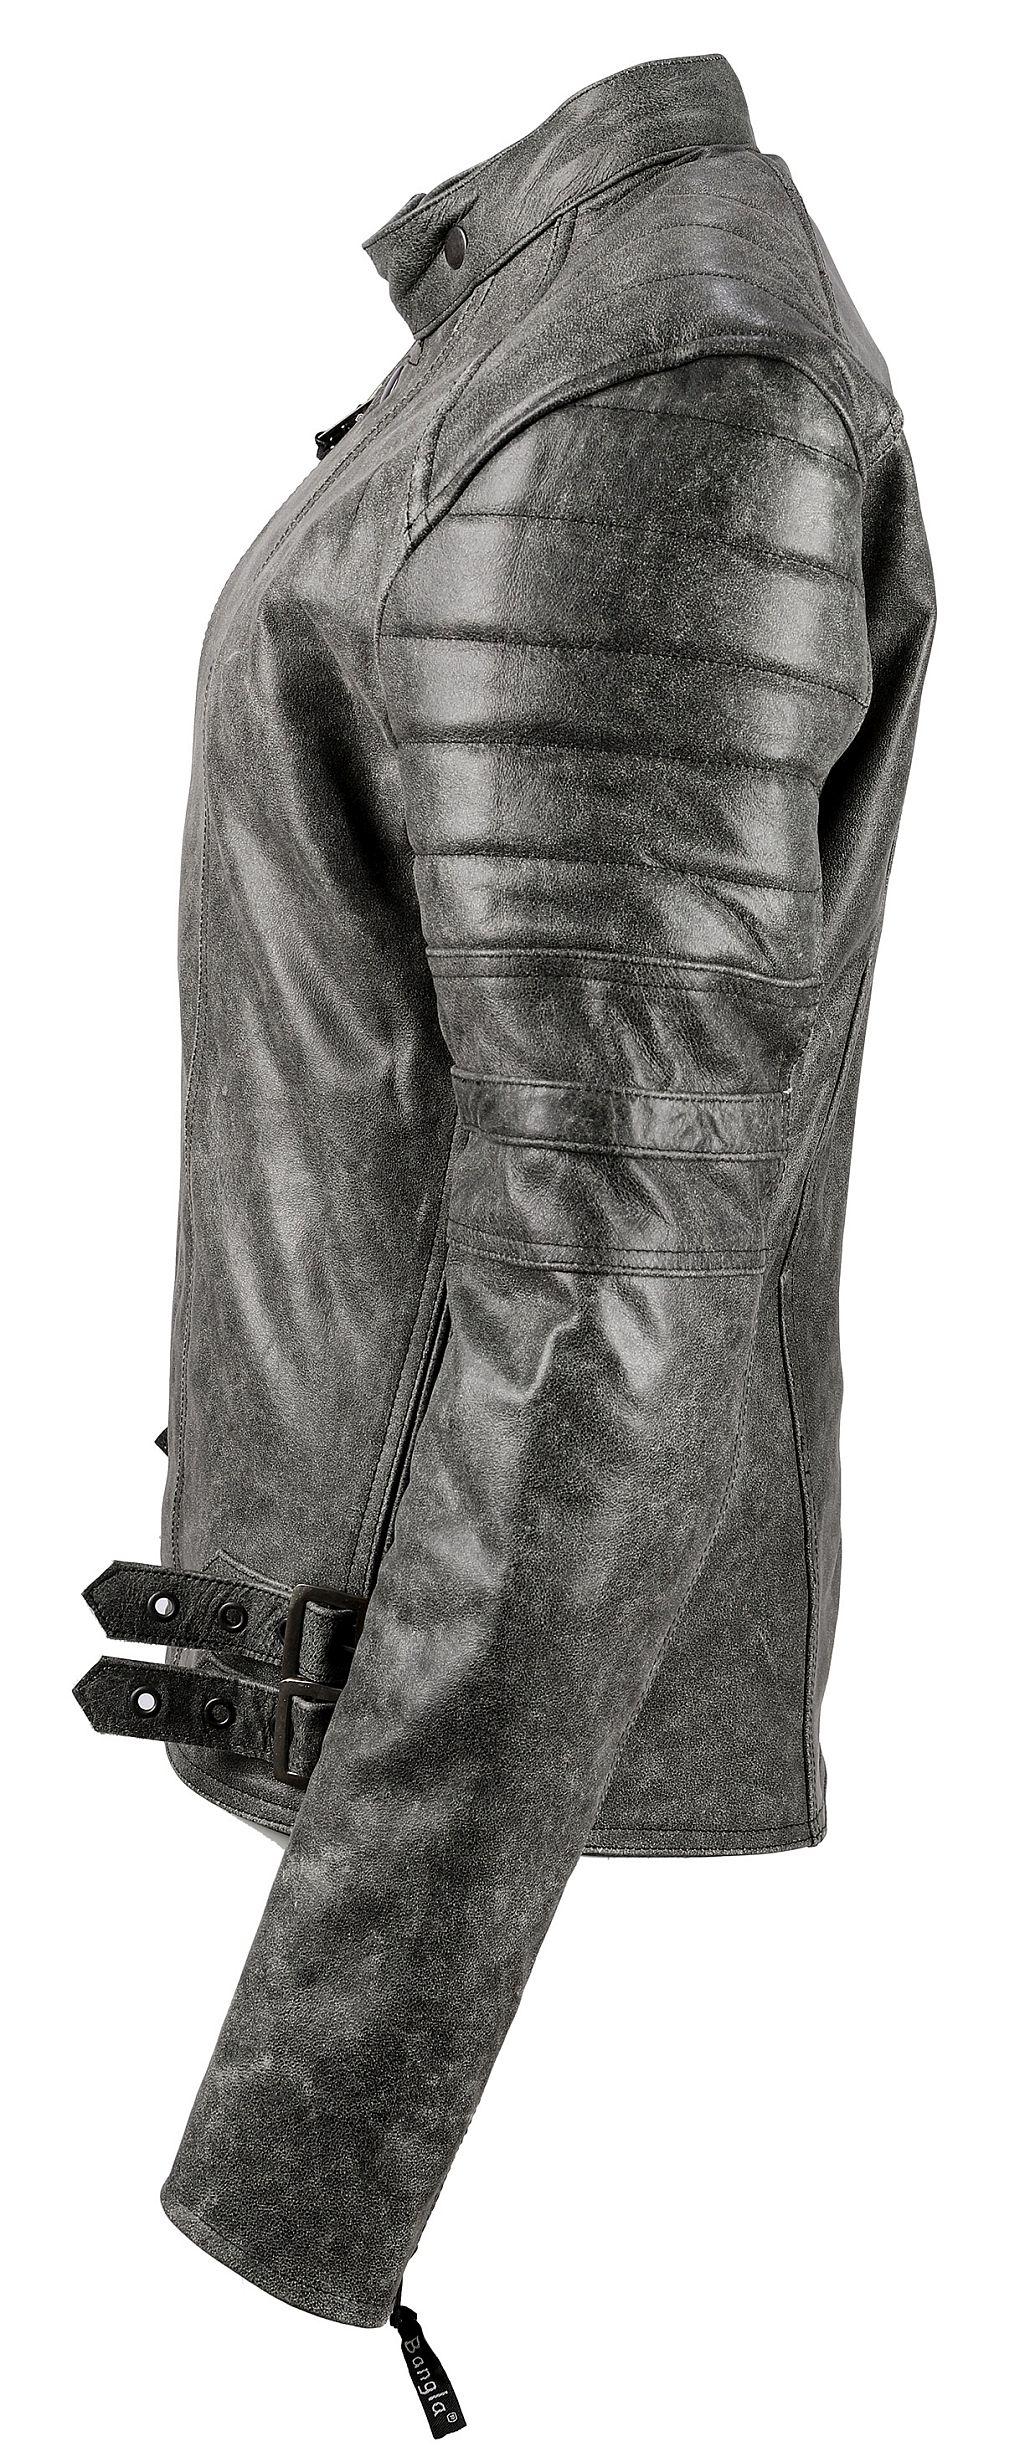 Motorradjacke Retro Klassik Jacke Lederjacke Chopperjacke Protektor Grau S-6 XL